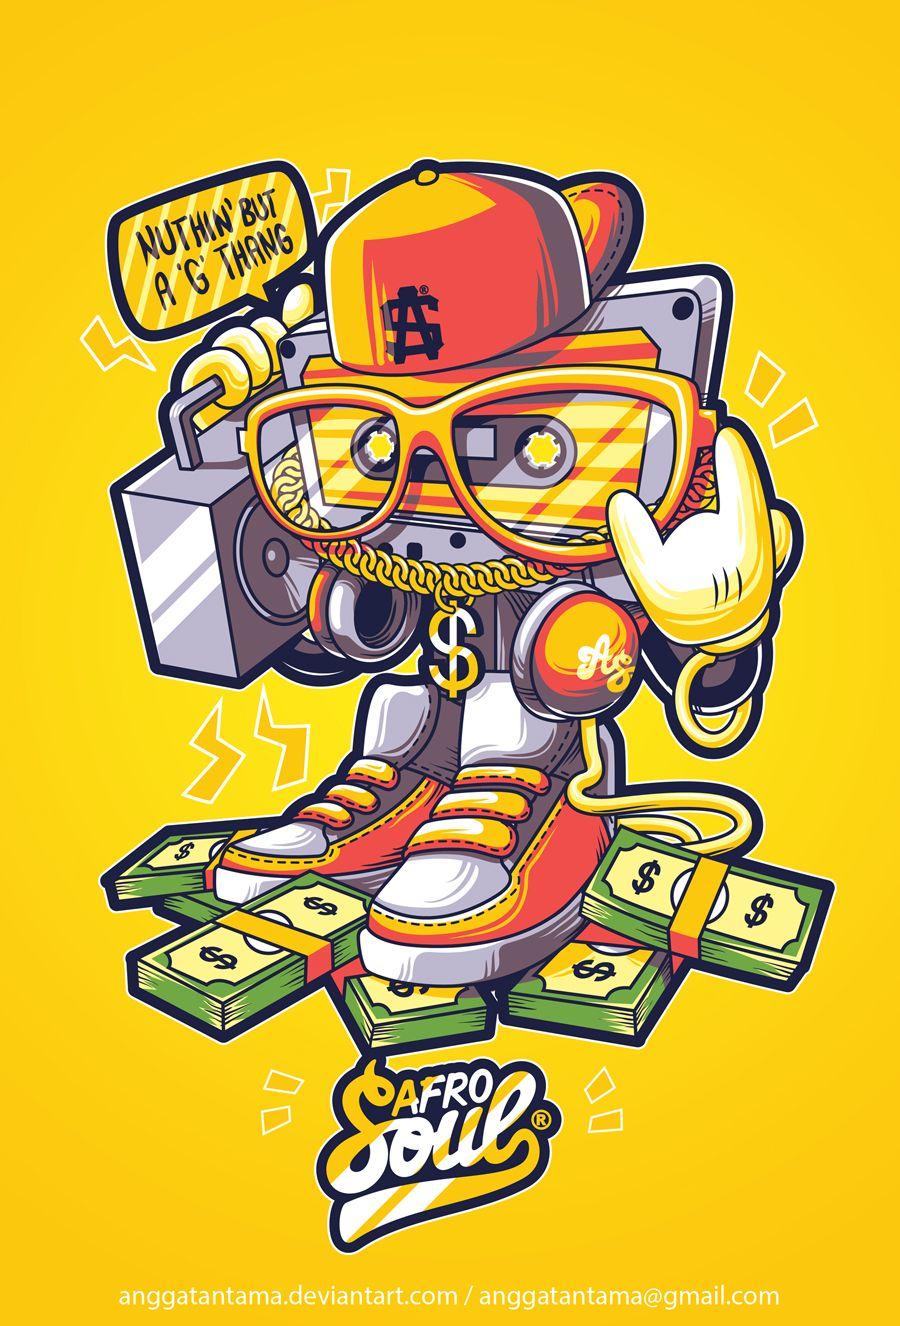 Hip Hop Time By Anggatantama On Deviantart